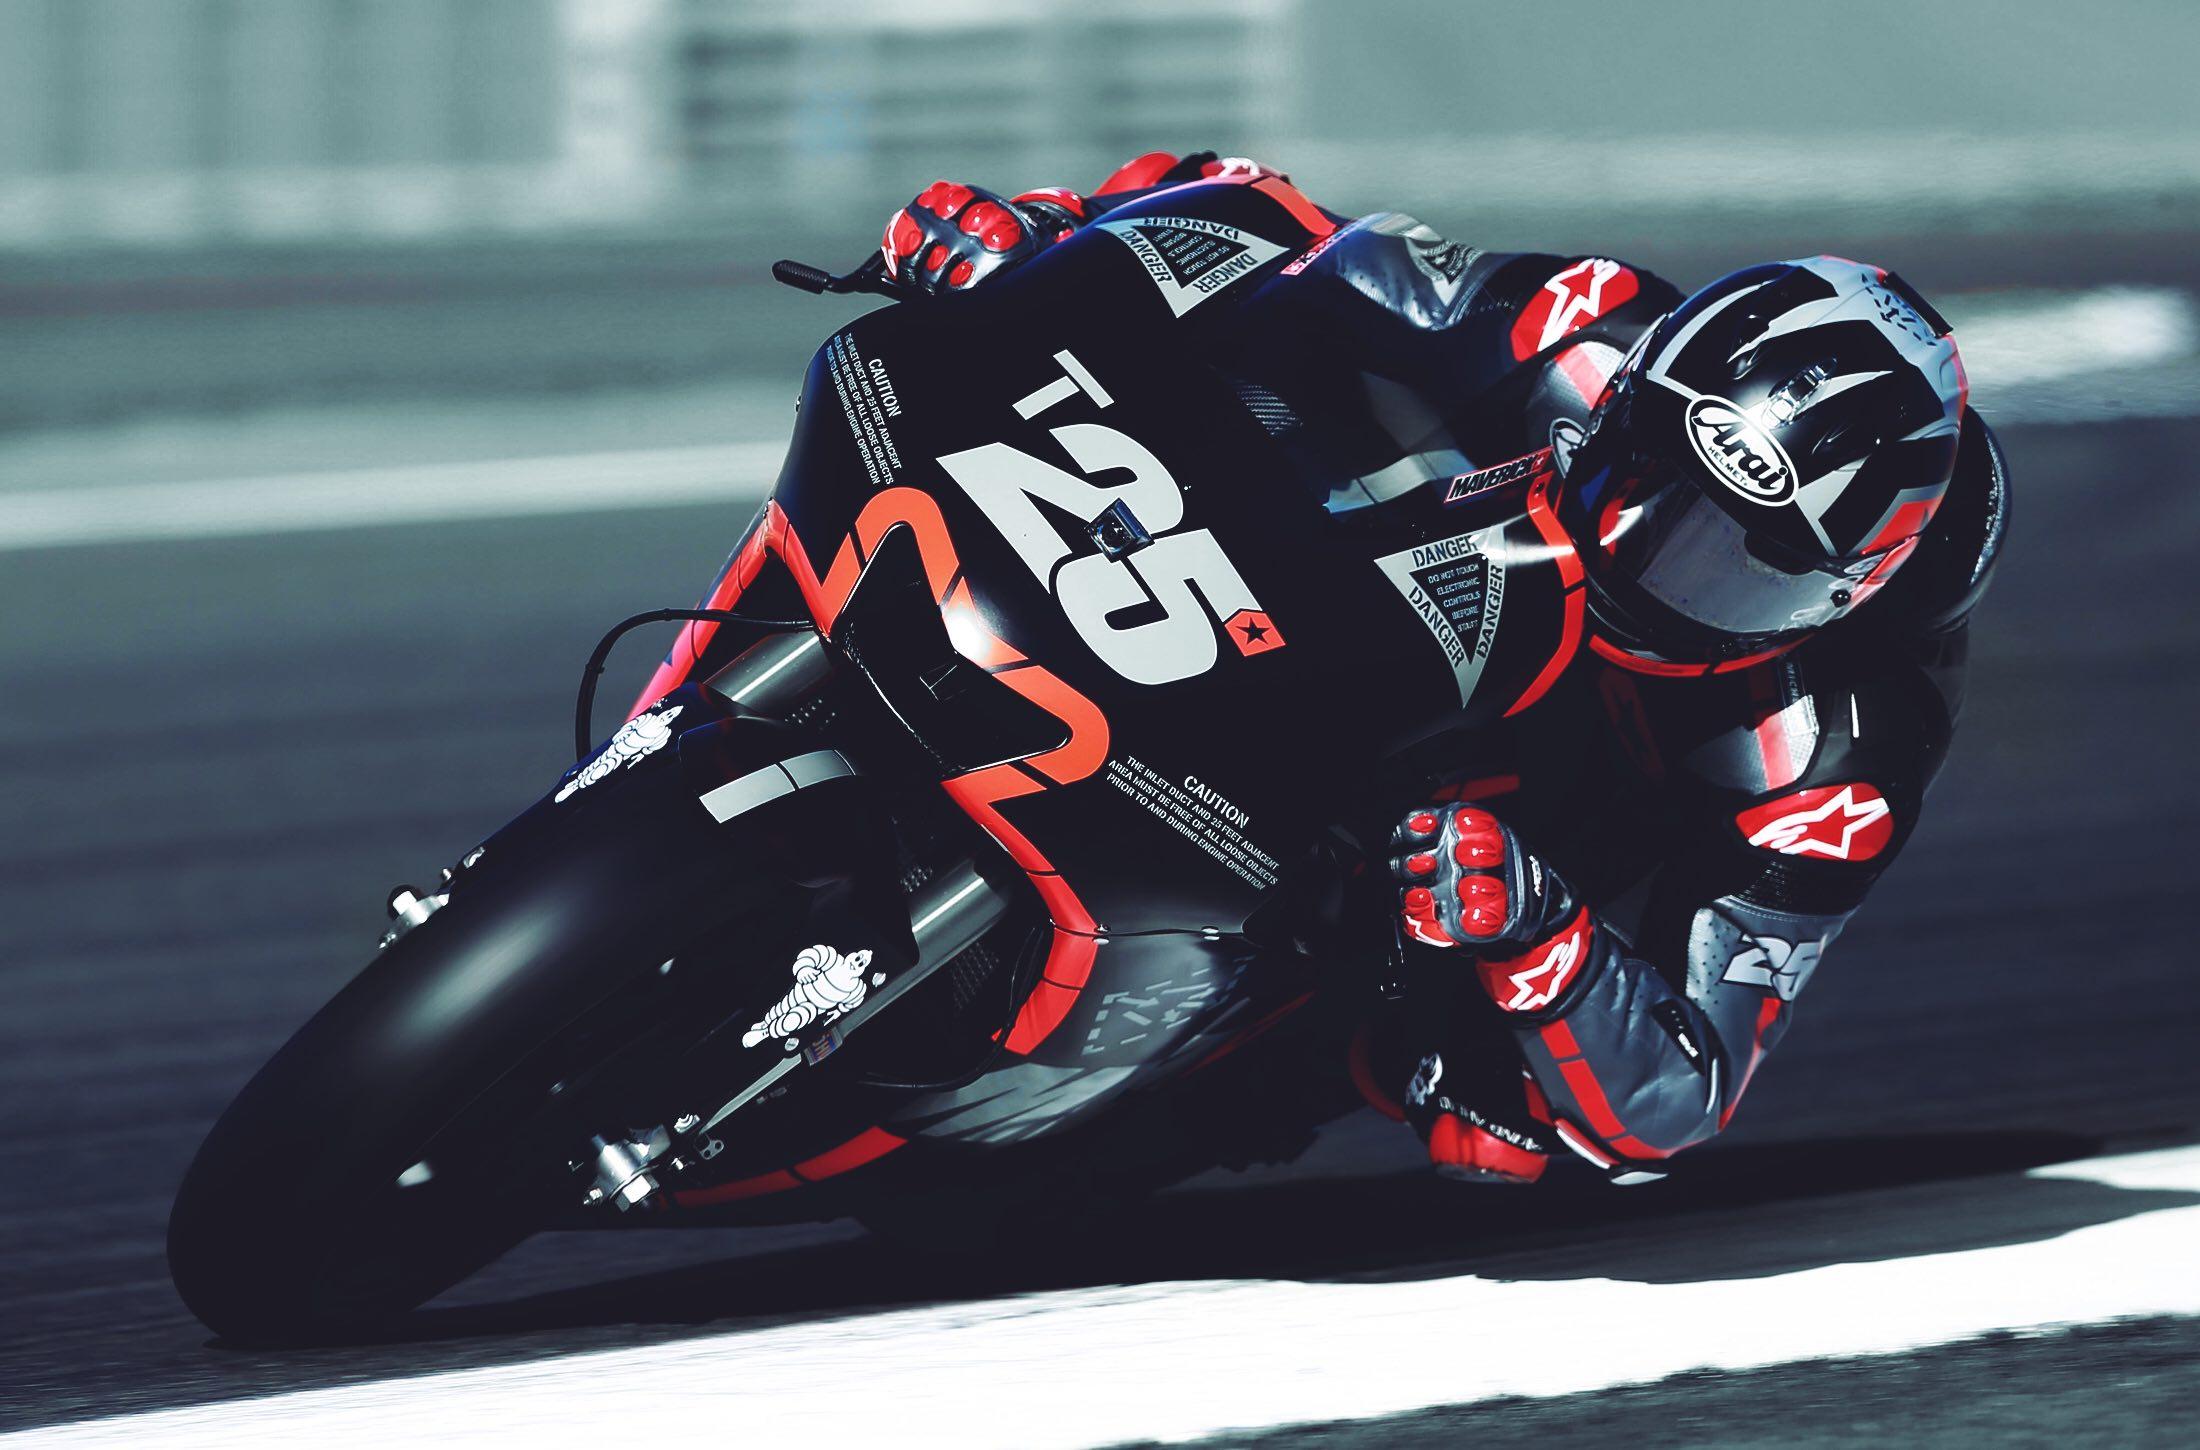 Maverick Viñales bate a Marc Márquez en el estreno de MotoGP 2017